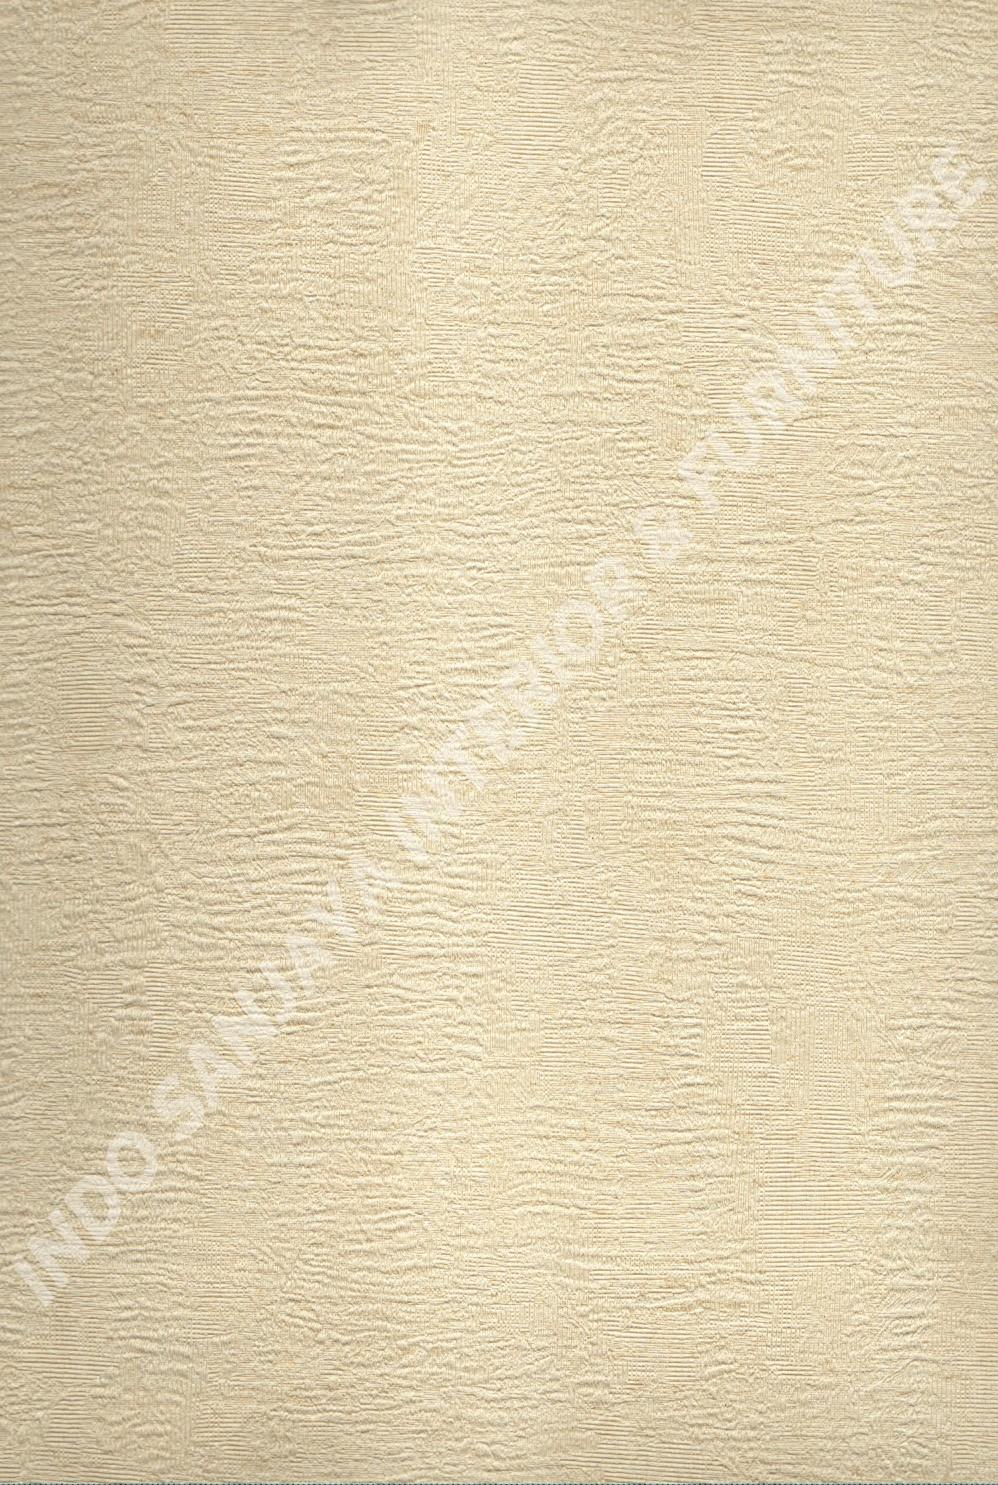 wallpaper HONOR:51014-1 corak Minimalis / Polos warna Cream